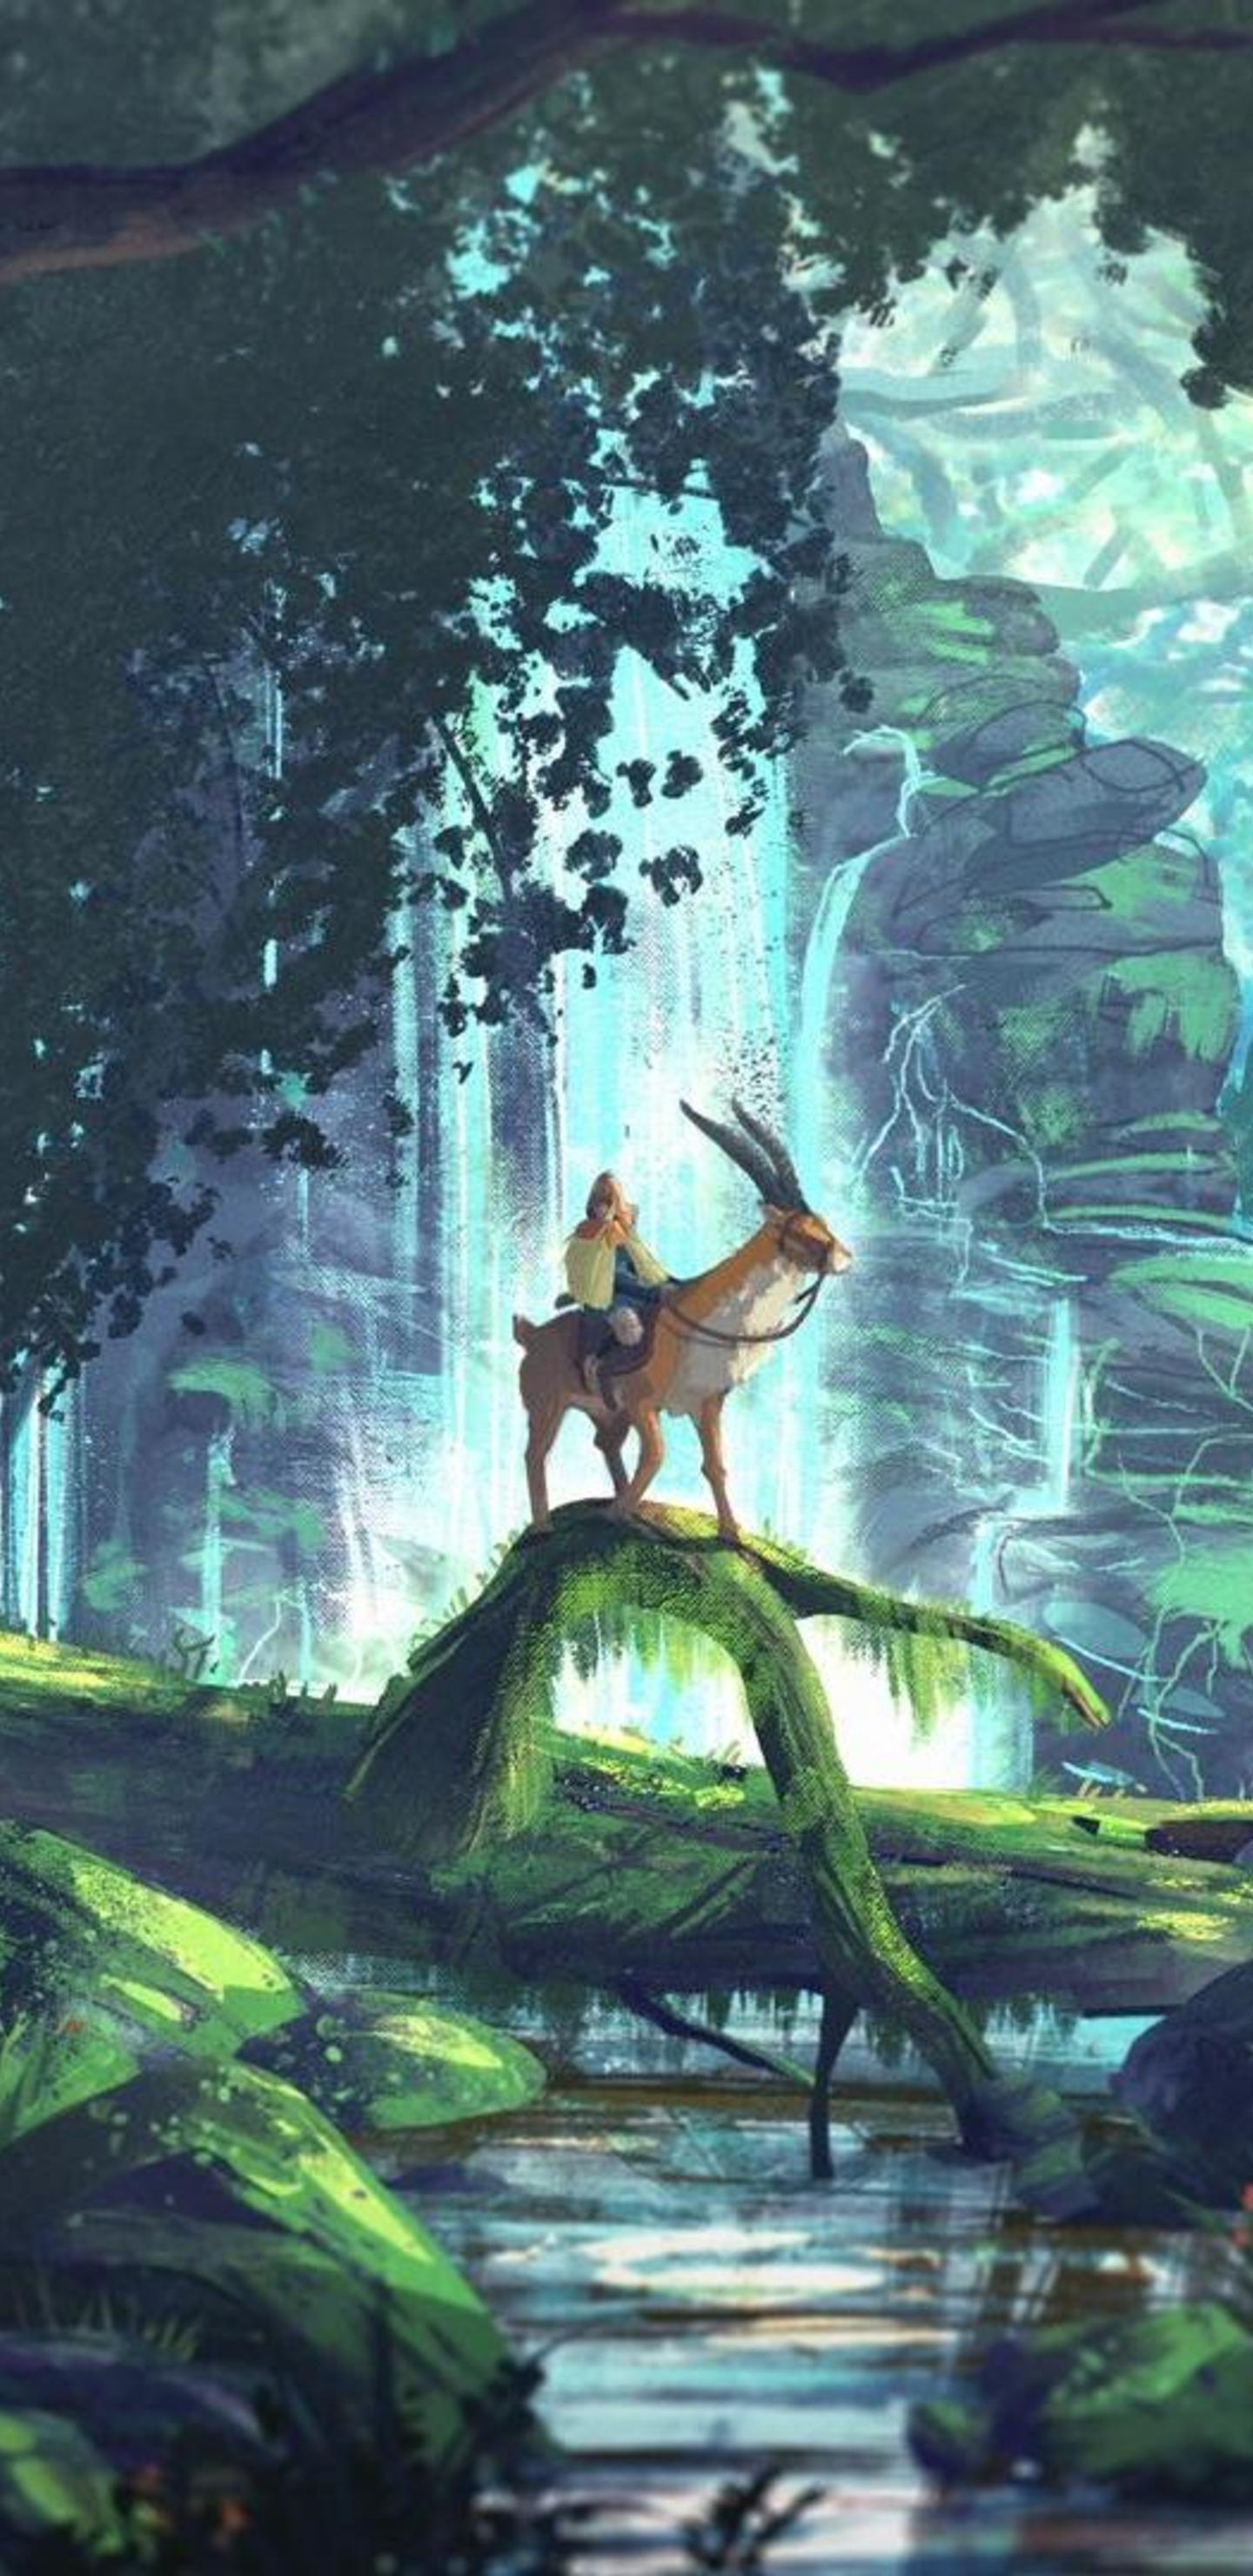 Princess Mononoke Phone Wallpapers Top Free Princess Mononoke Phone Backgrounds Wallpaperaccess